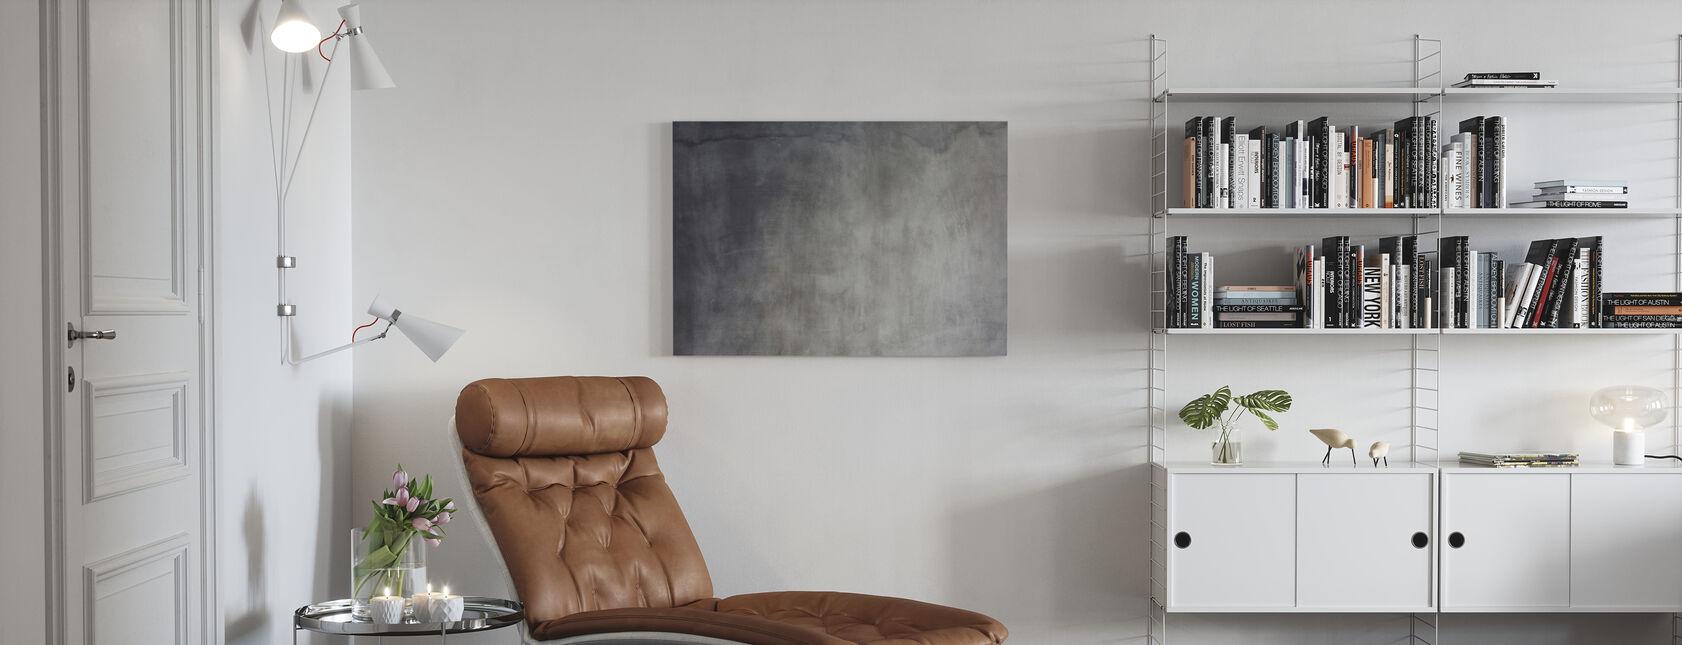 Betoni-studio - Canvastaulu - Olohuone